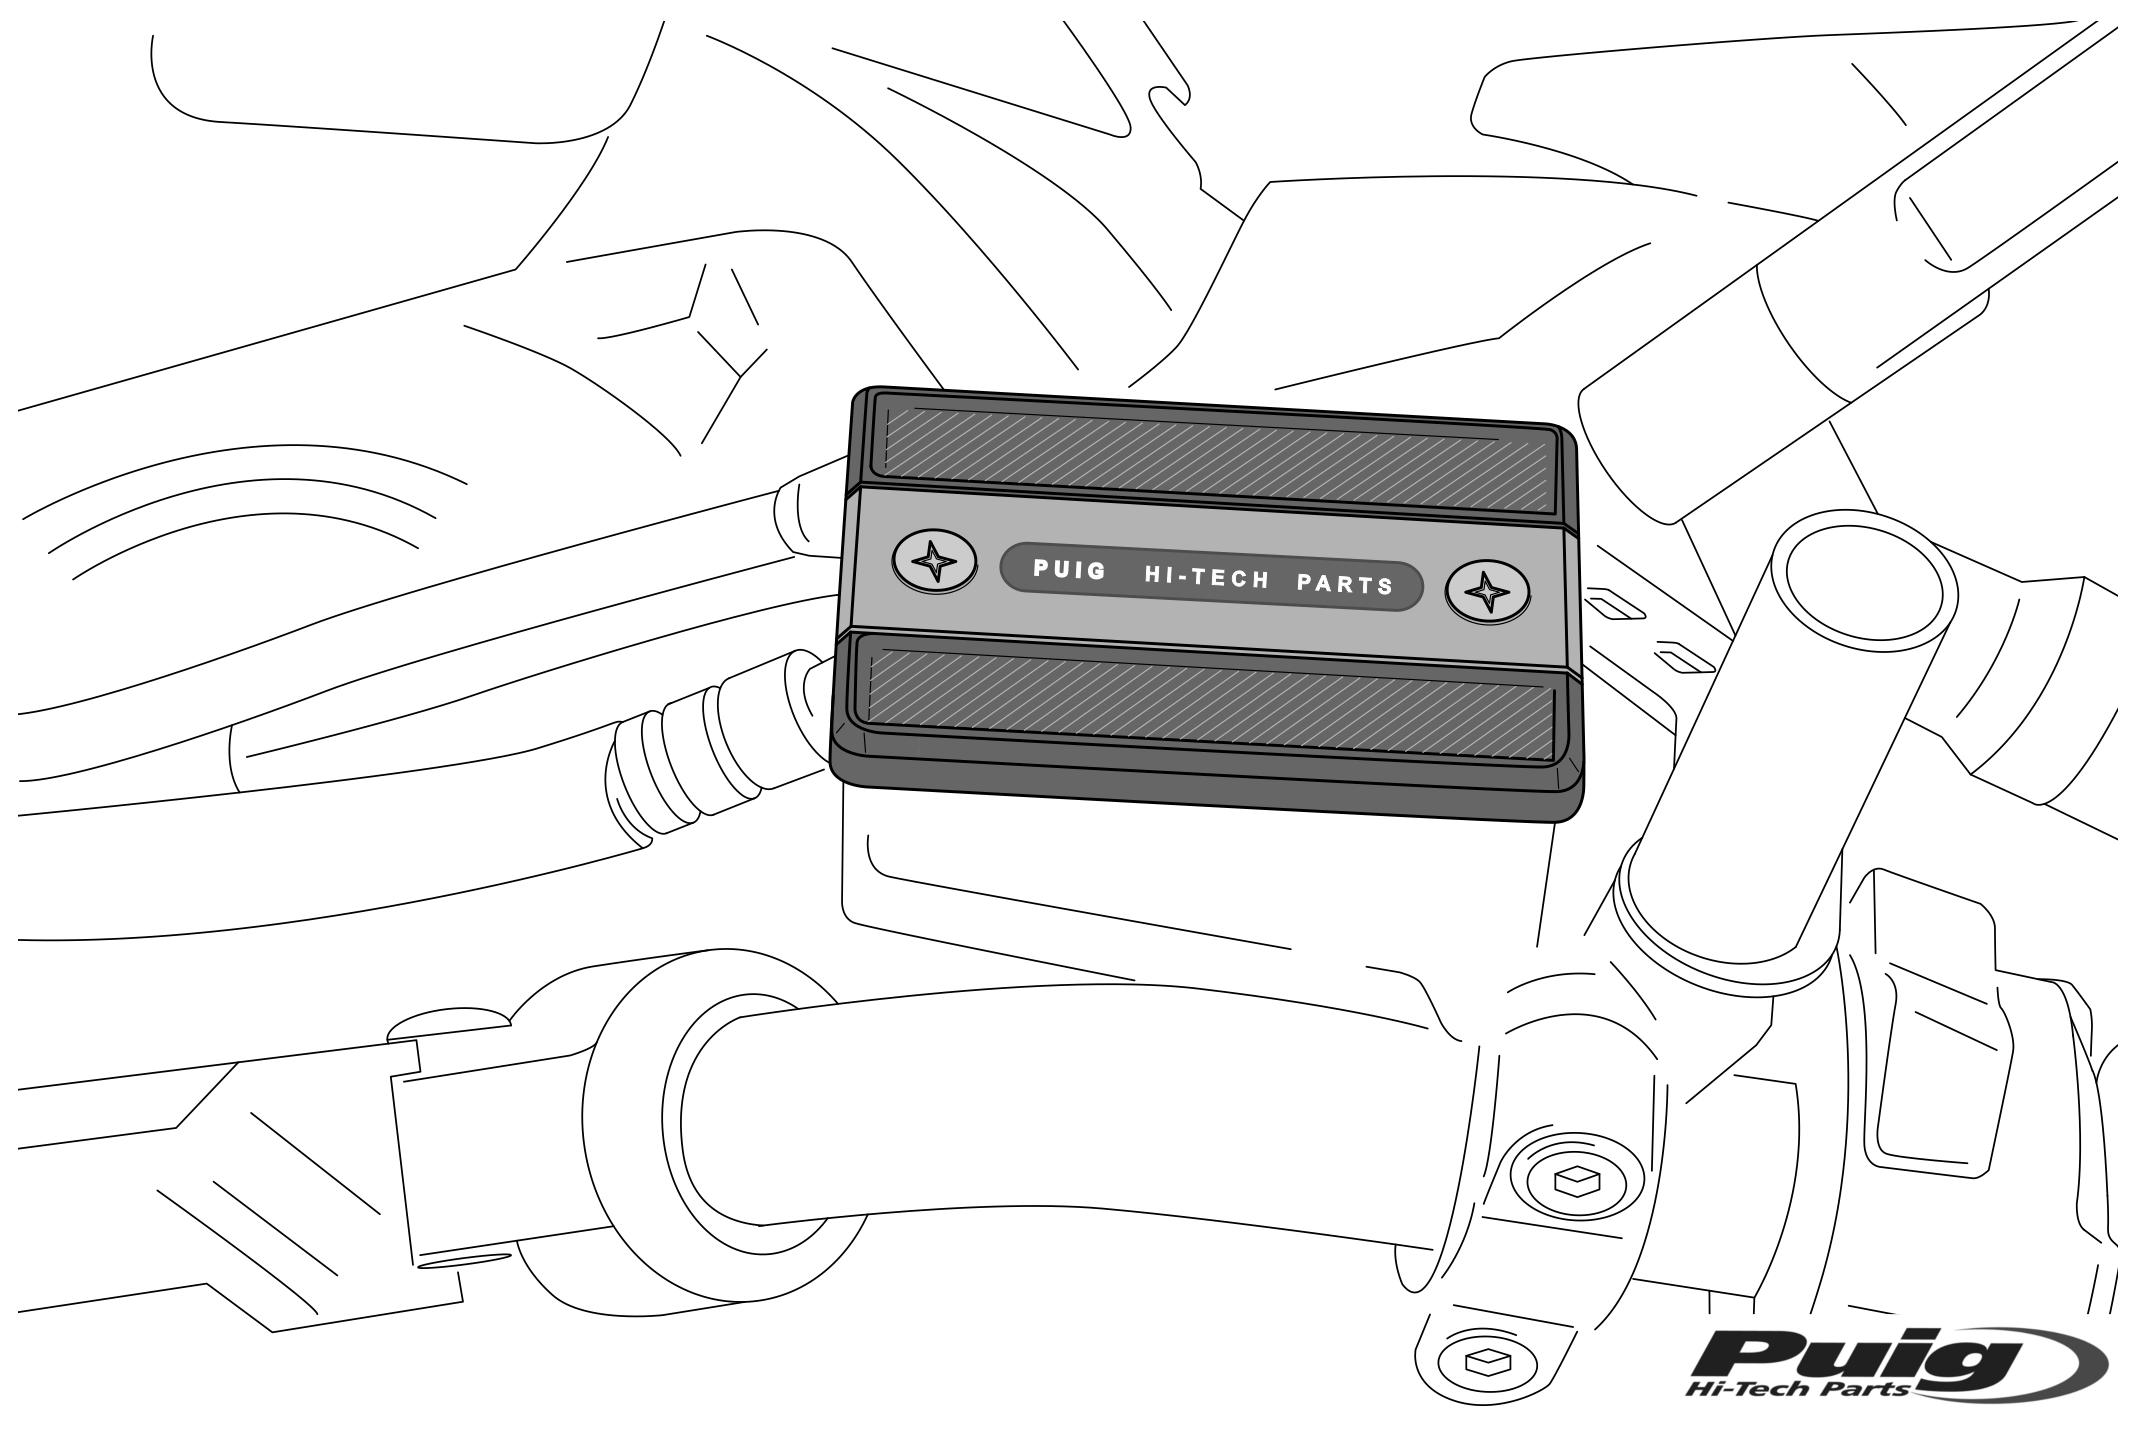 Products - Motoplastic PUIG